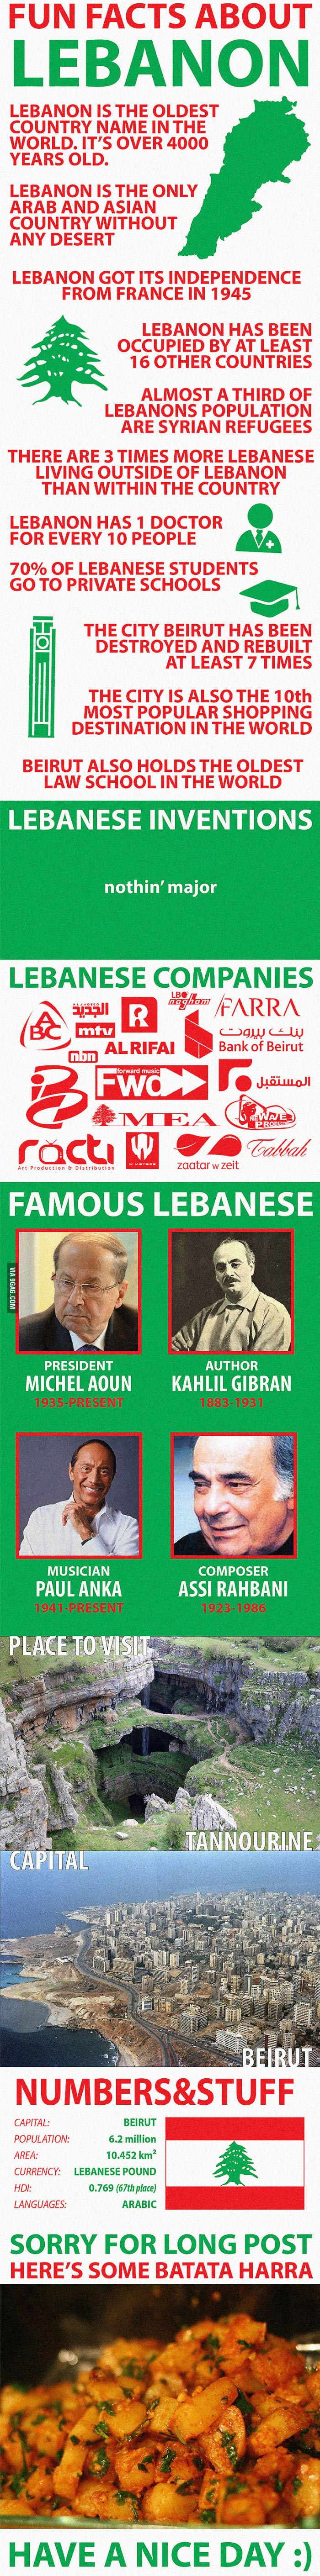 Fun Facts about Lebanon